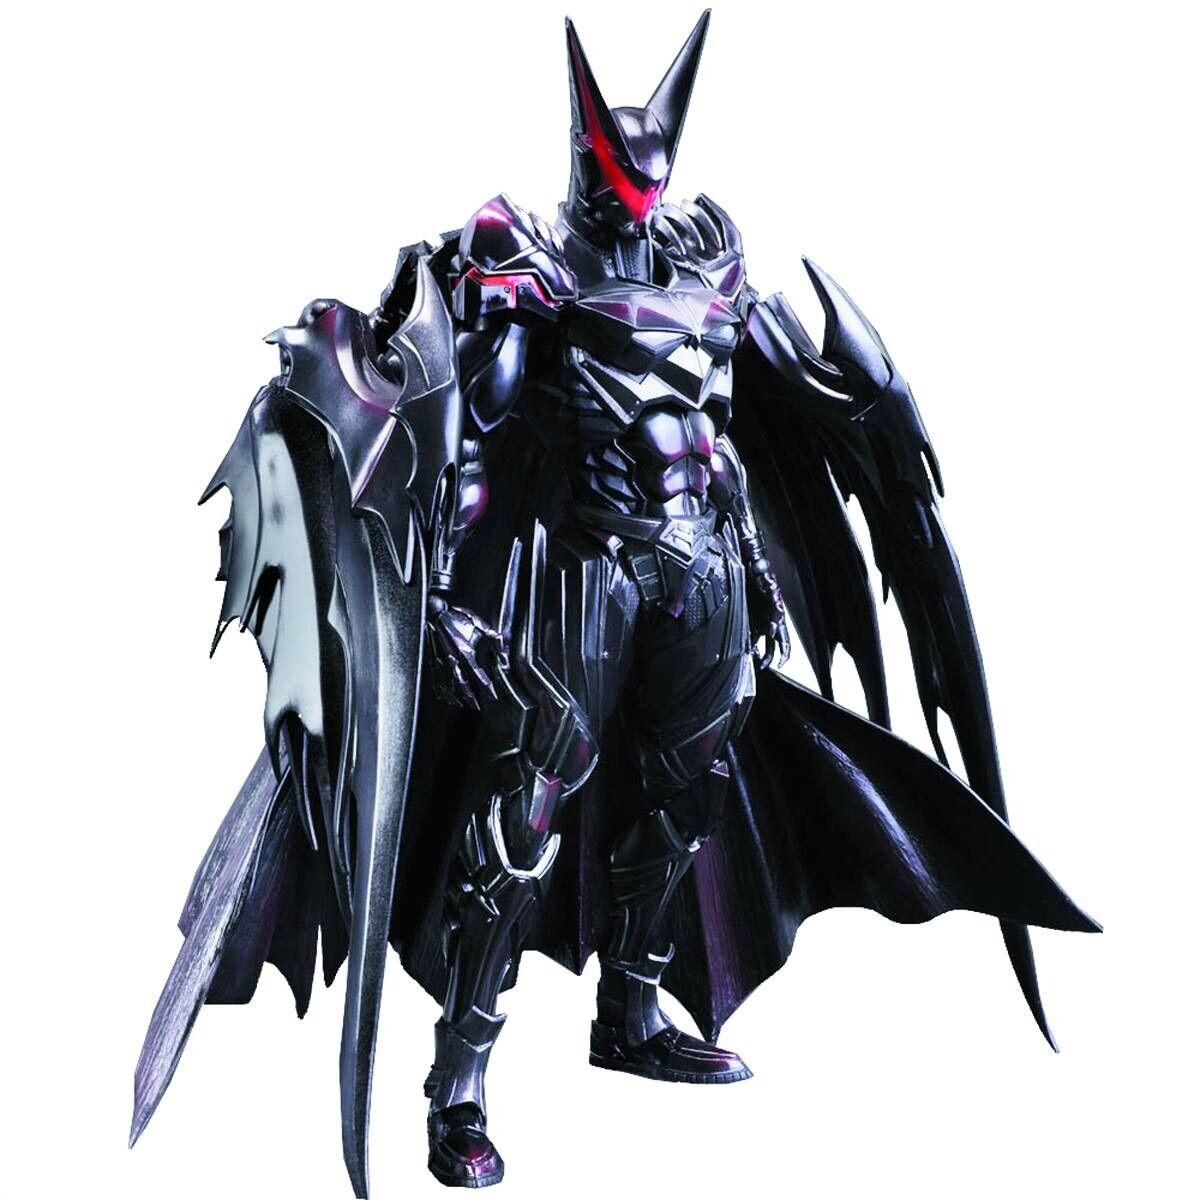 Dc Comics Variant Play Arts Kai Batman Tetsuya Figura Mib final Fantasy